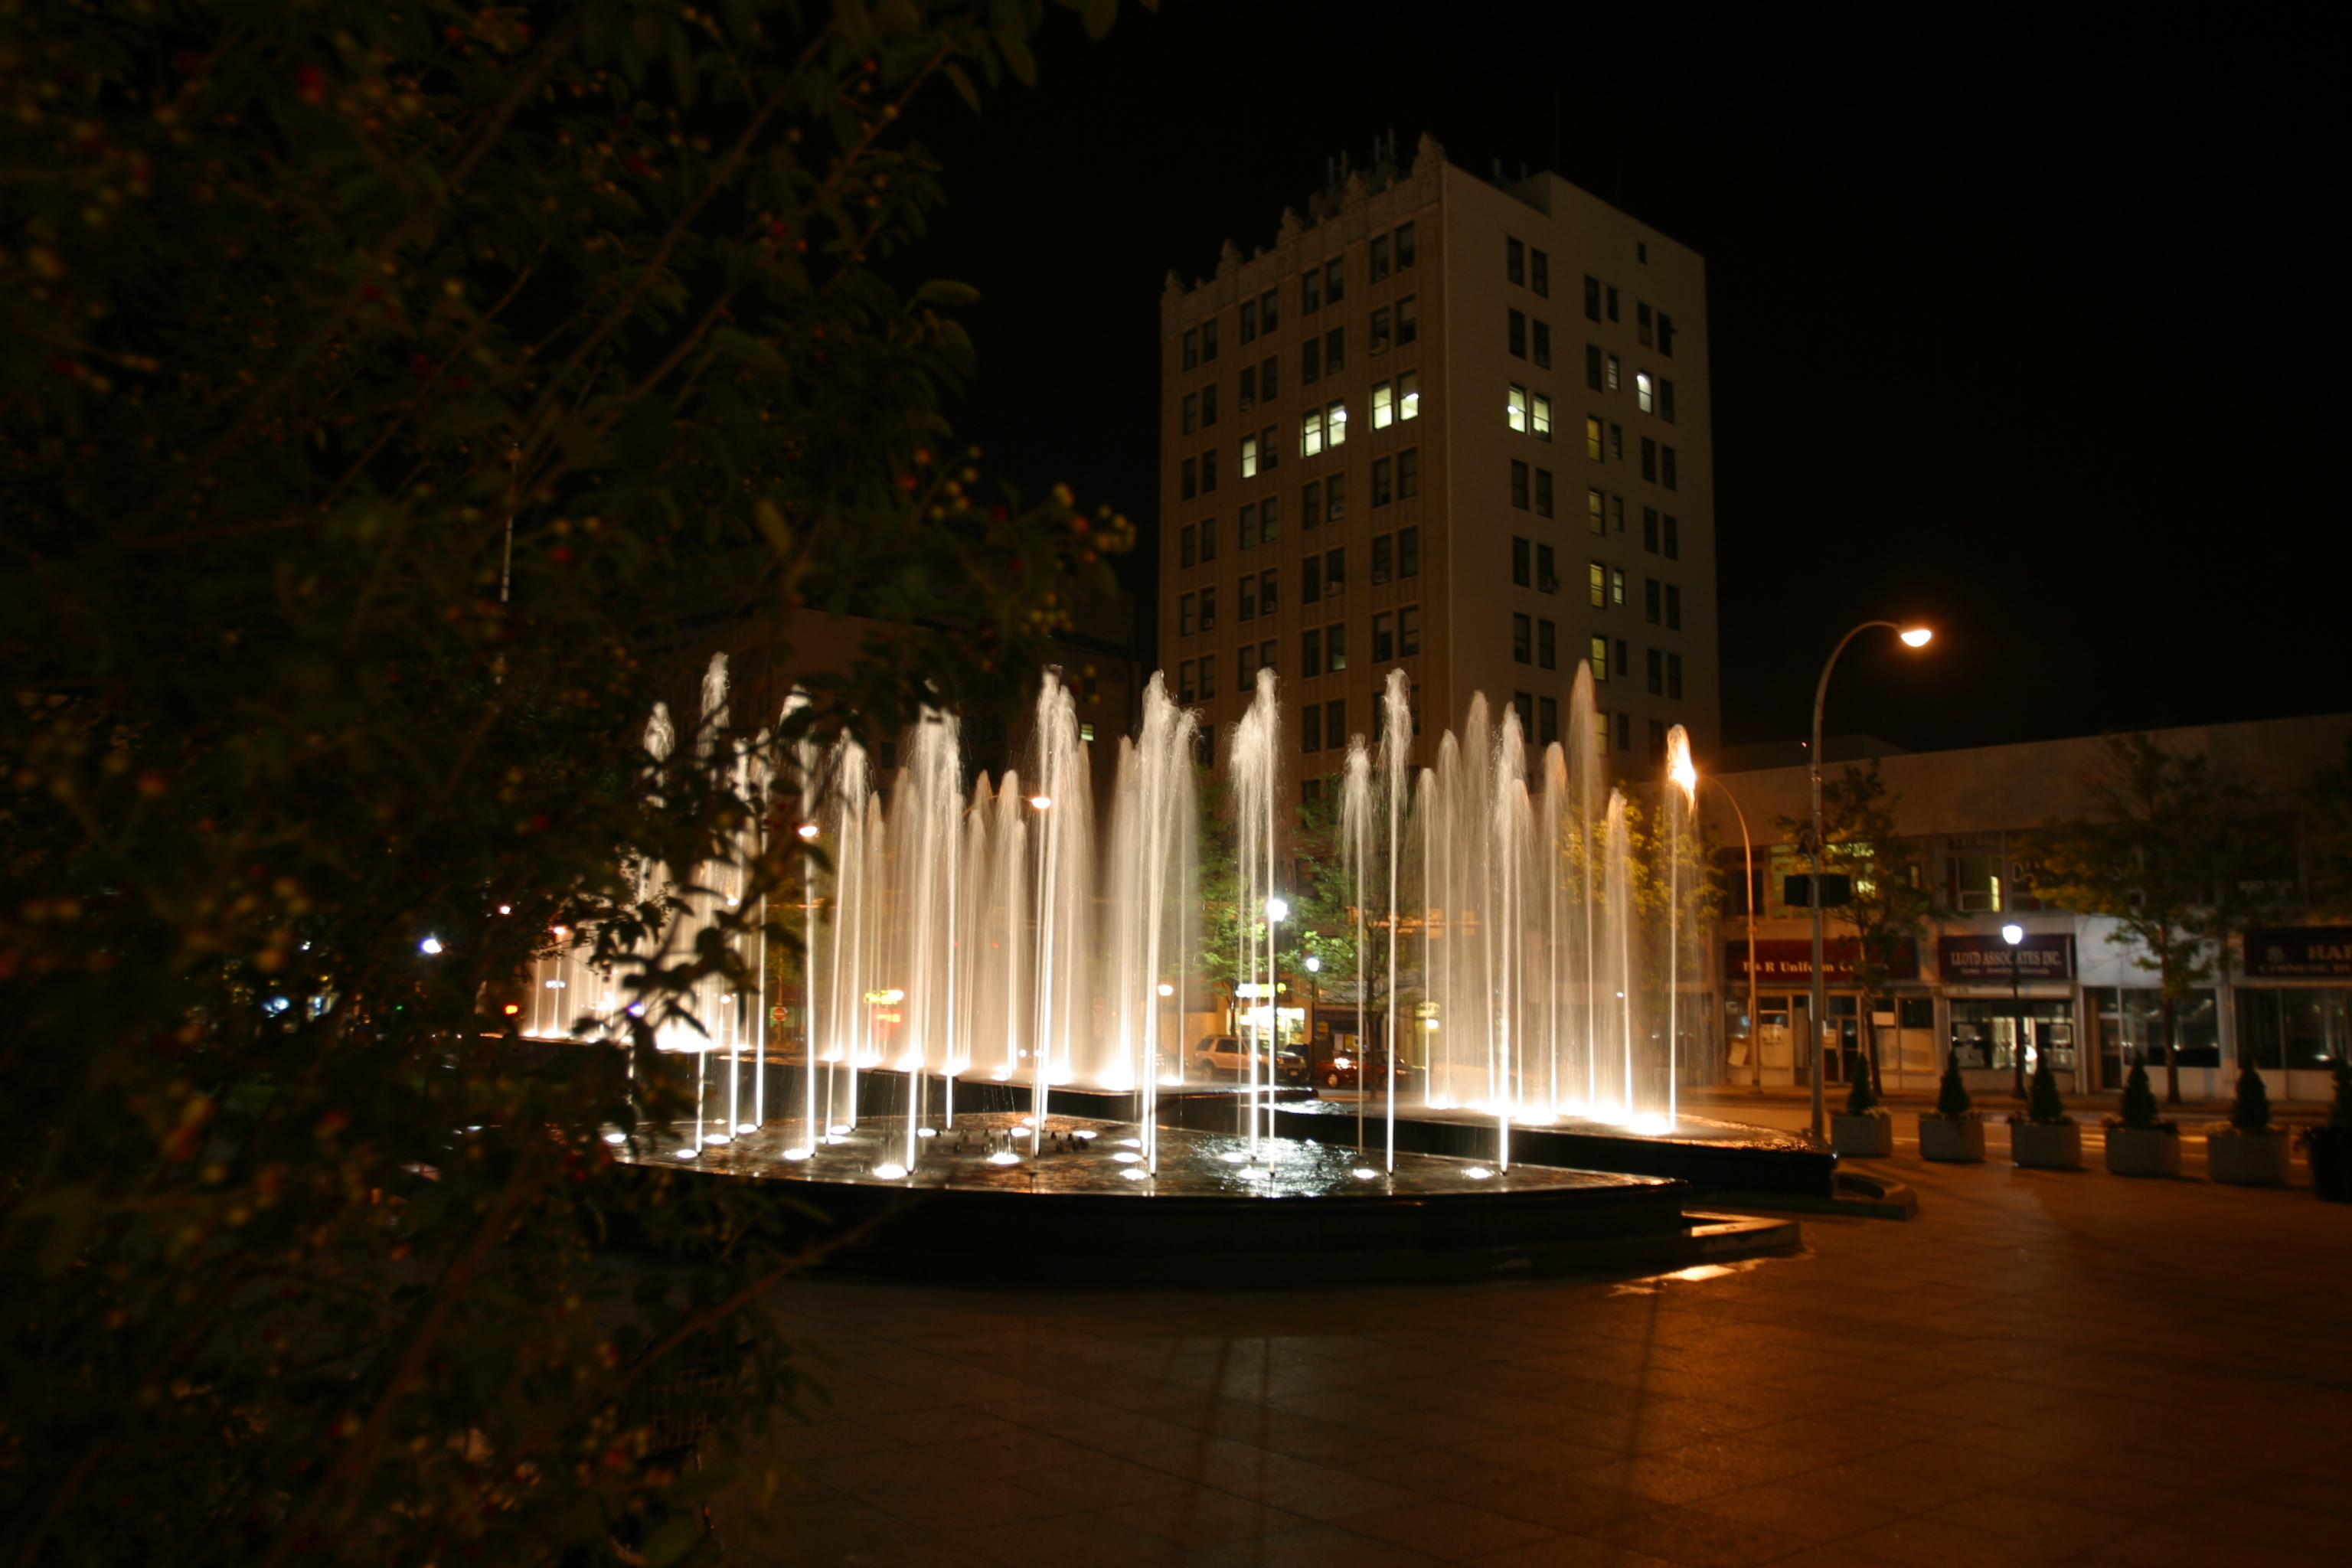 Renaissance Plaza Fountain